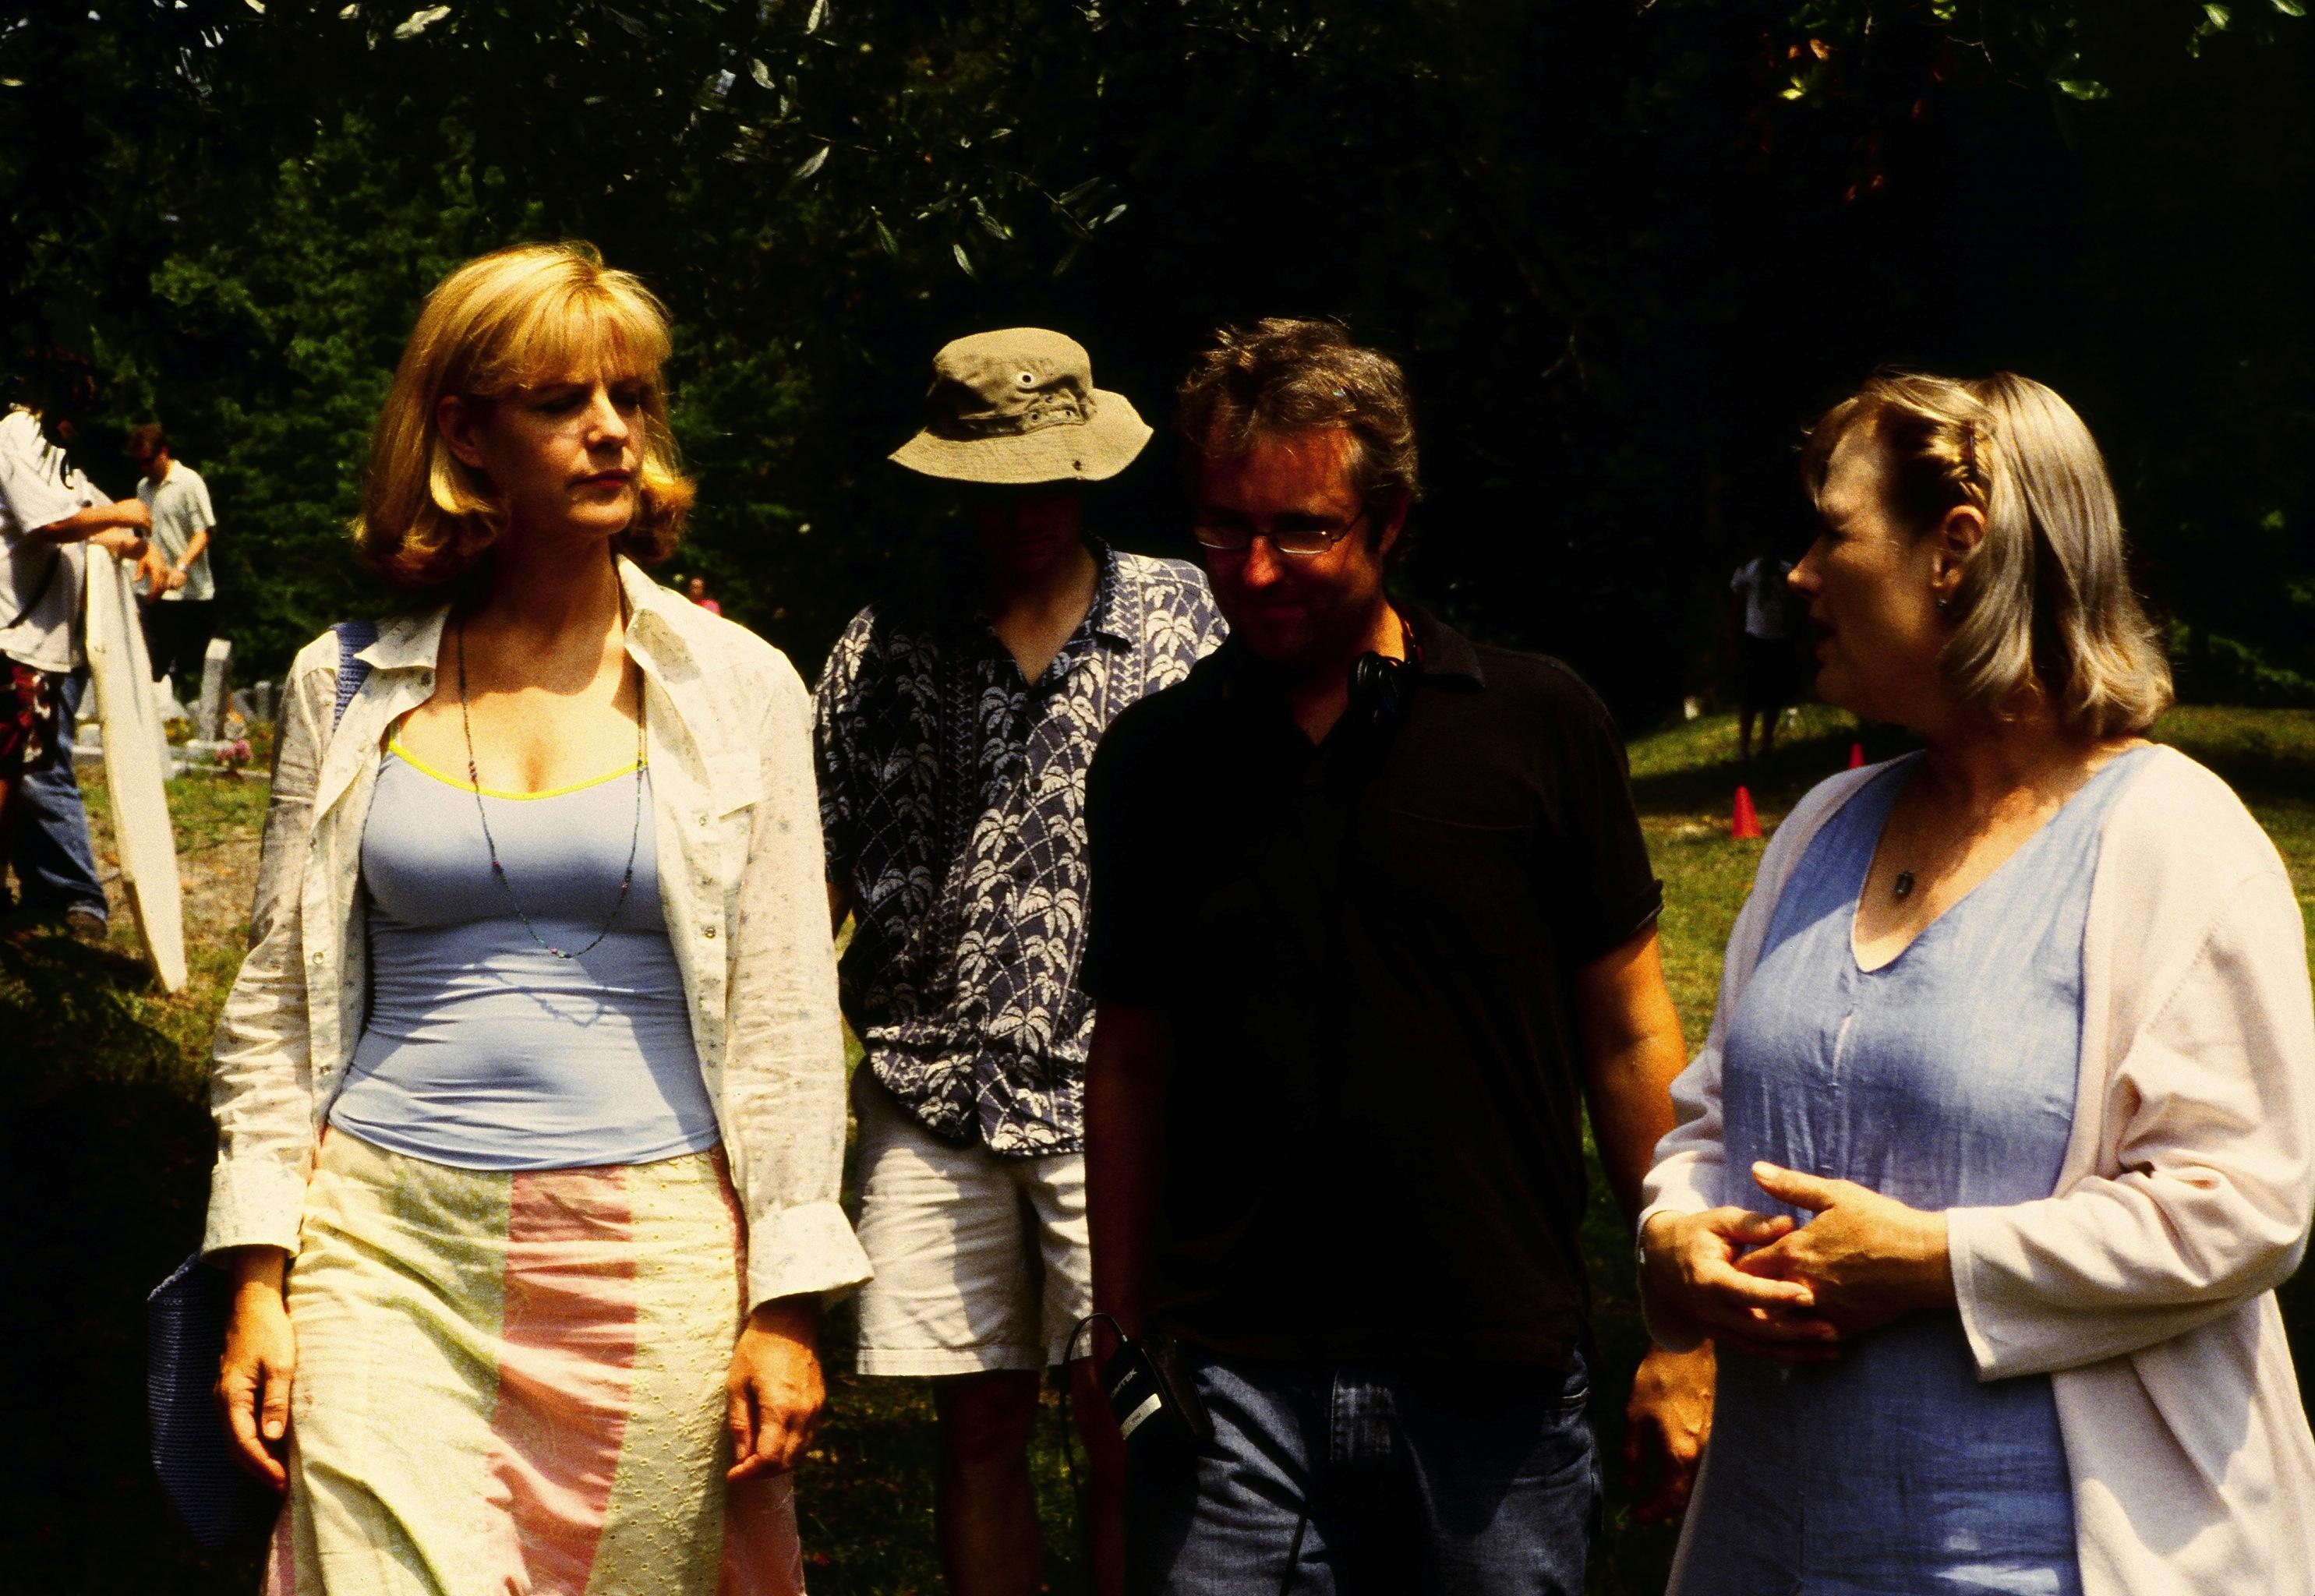 Tim Kirkman (center) directs Bonnie Hunt and Tess Harper in LOGGERHEADS.